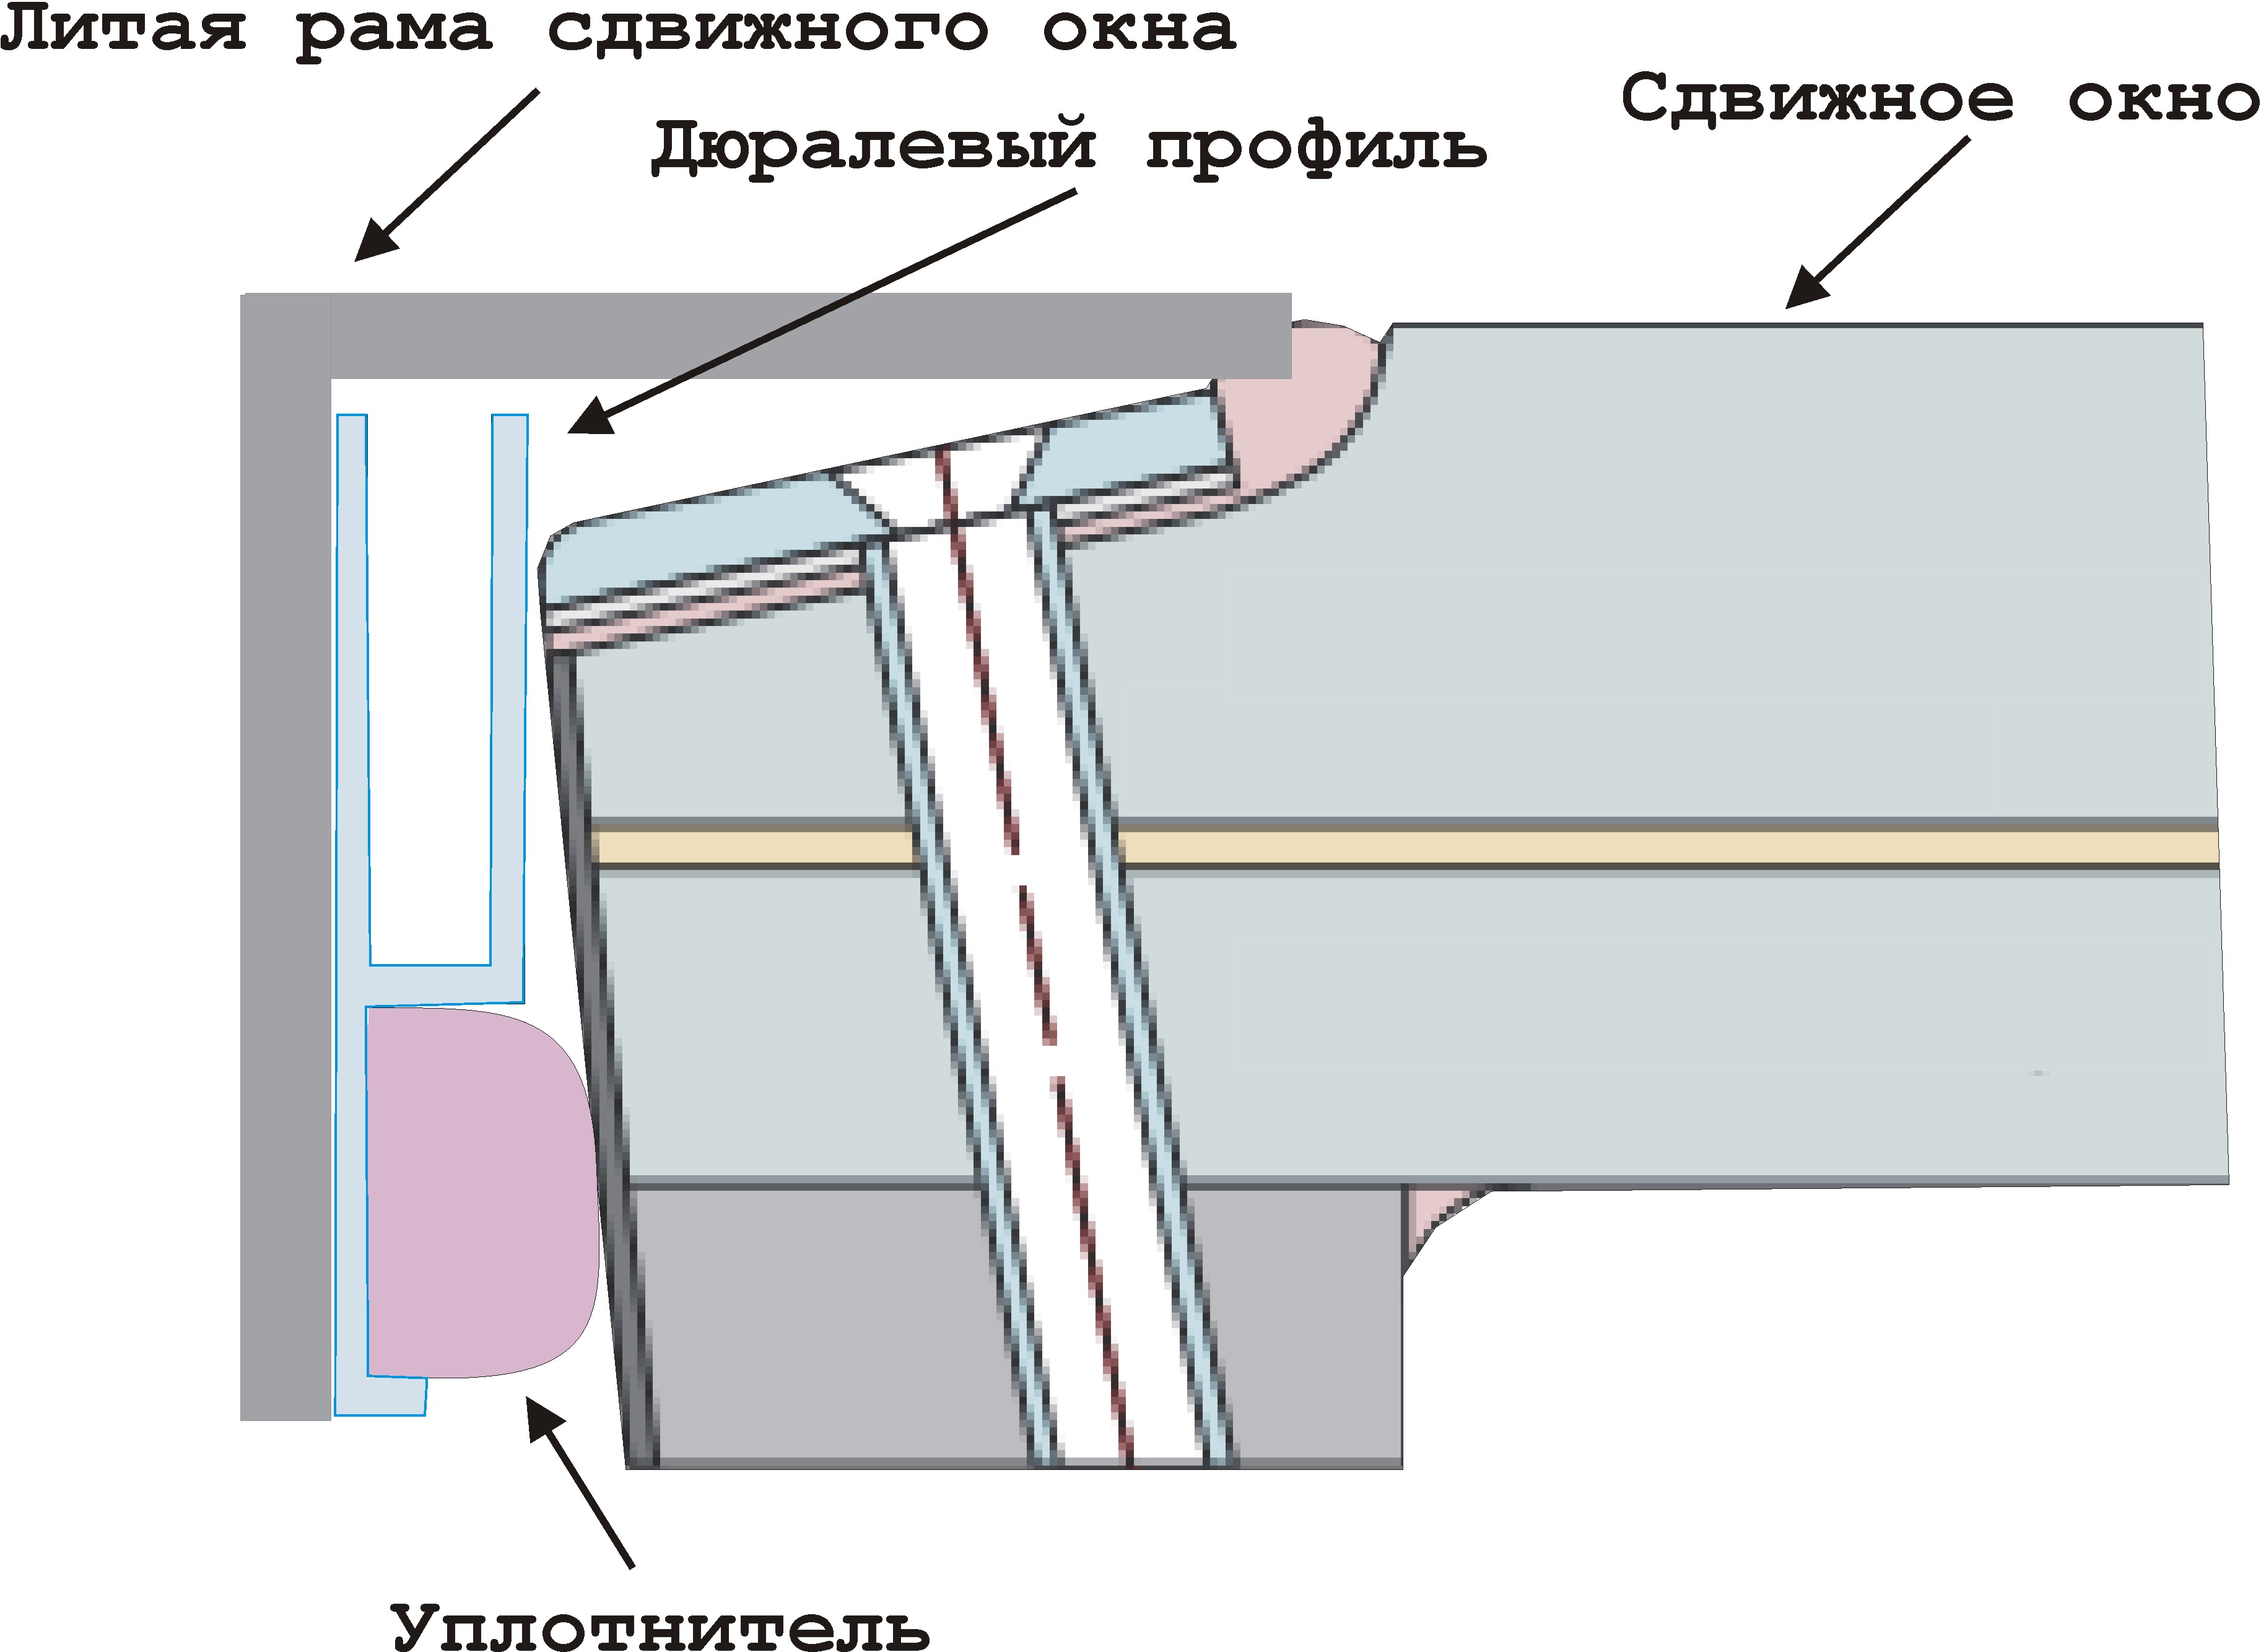 http://images.vfl.ru/ii/1568218804/2ca4bb20/27831550.jpg